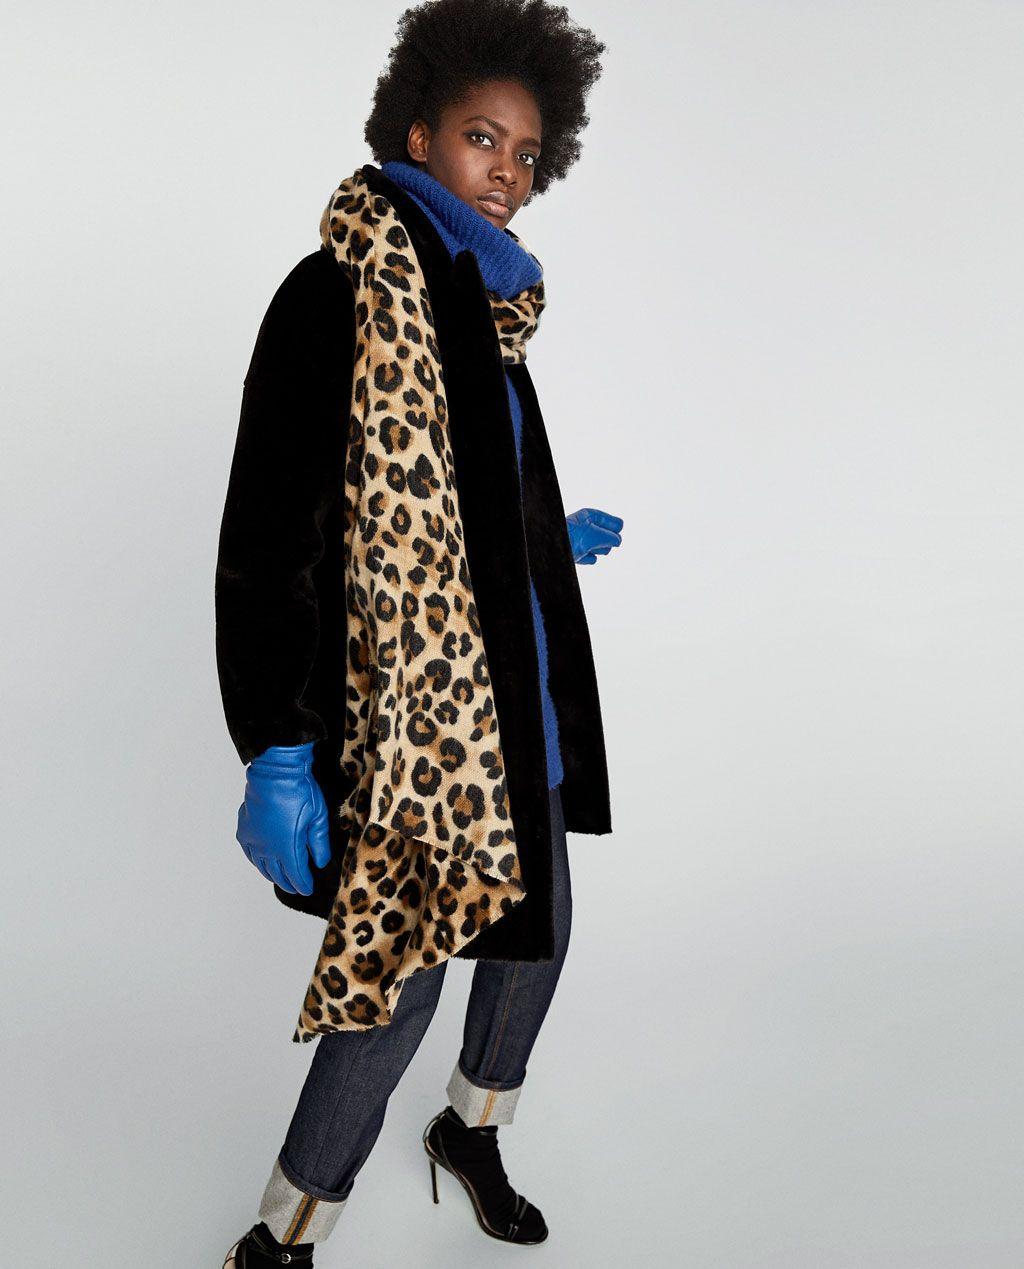 45737395e83a2c PAÑUELO ESTAMPADO ANIMAL   passionforfashion   Animal print scarf ...